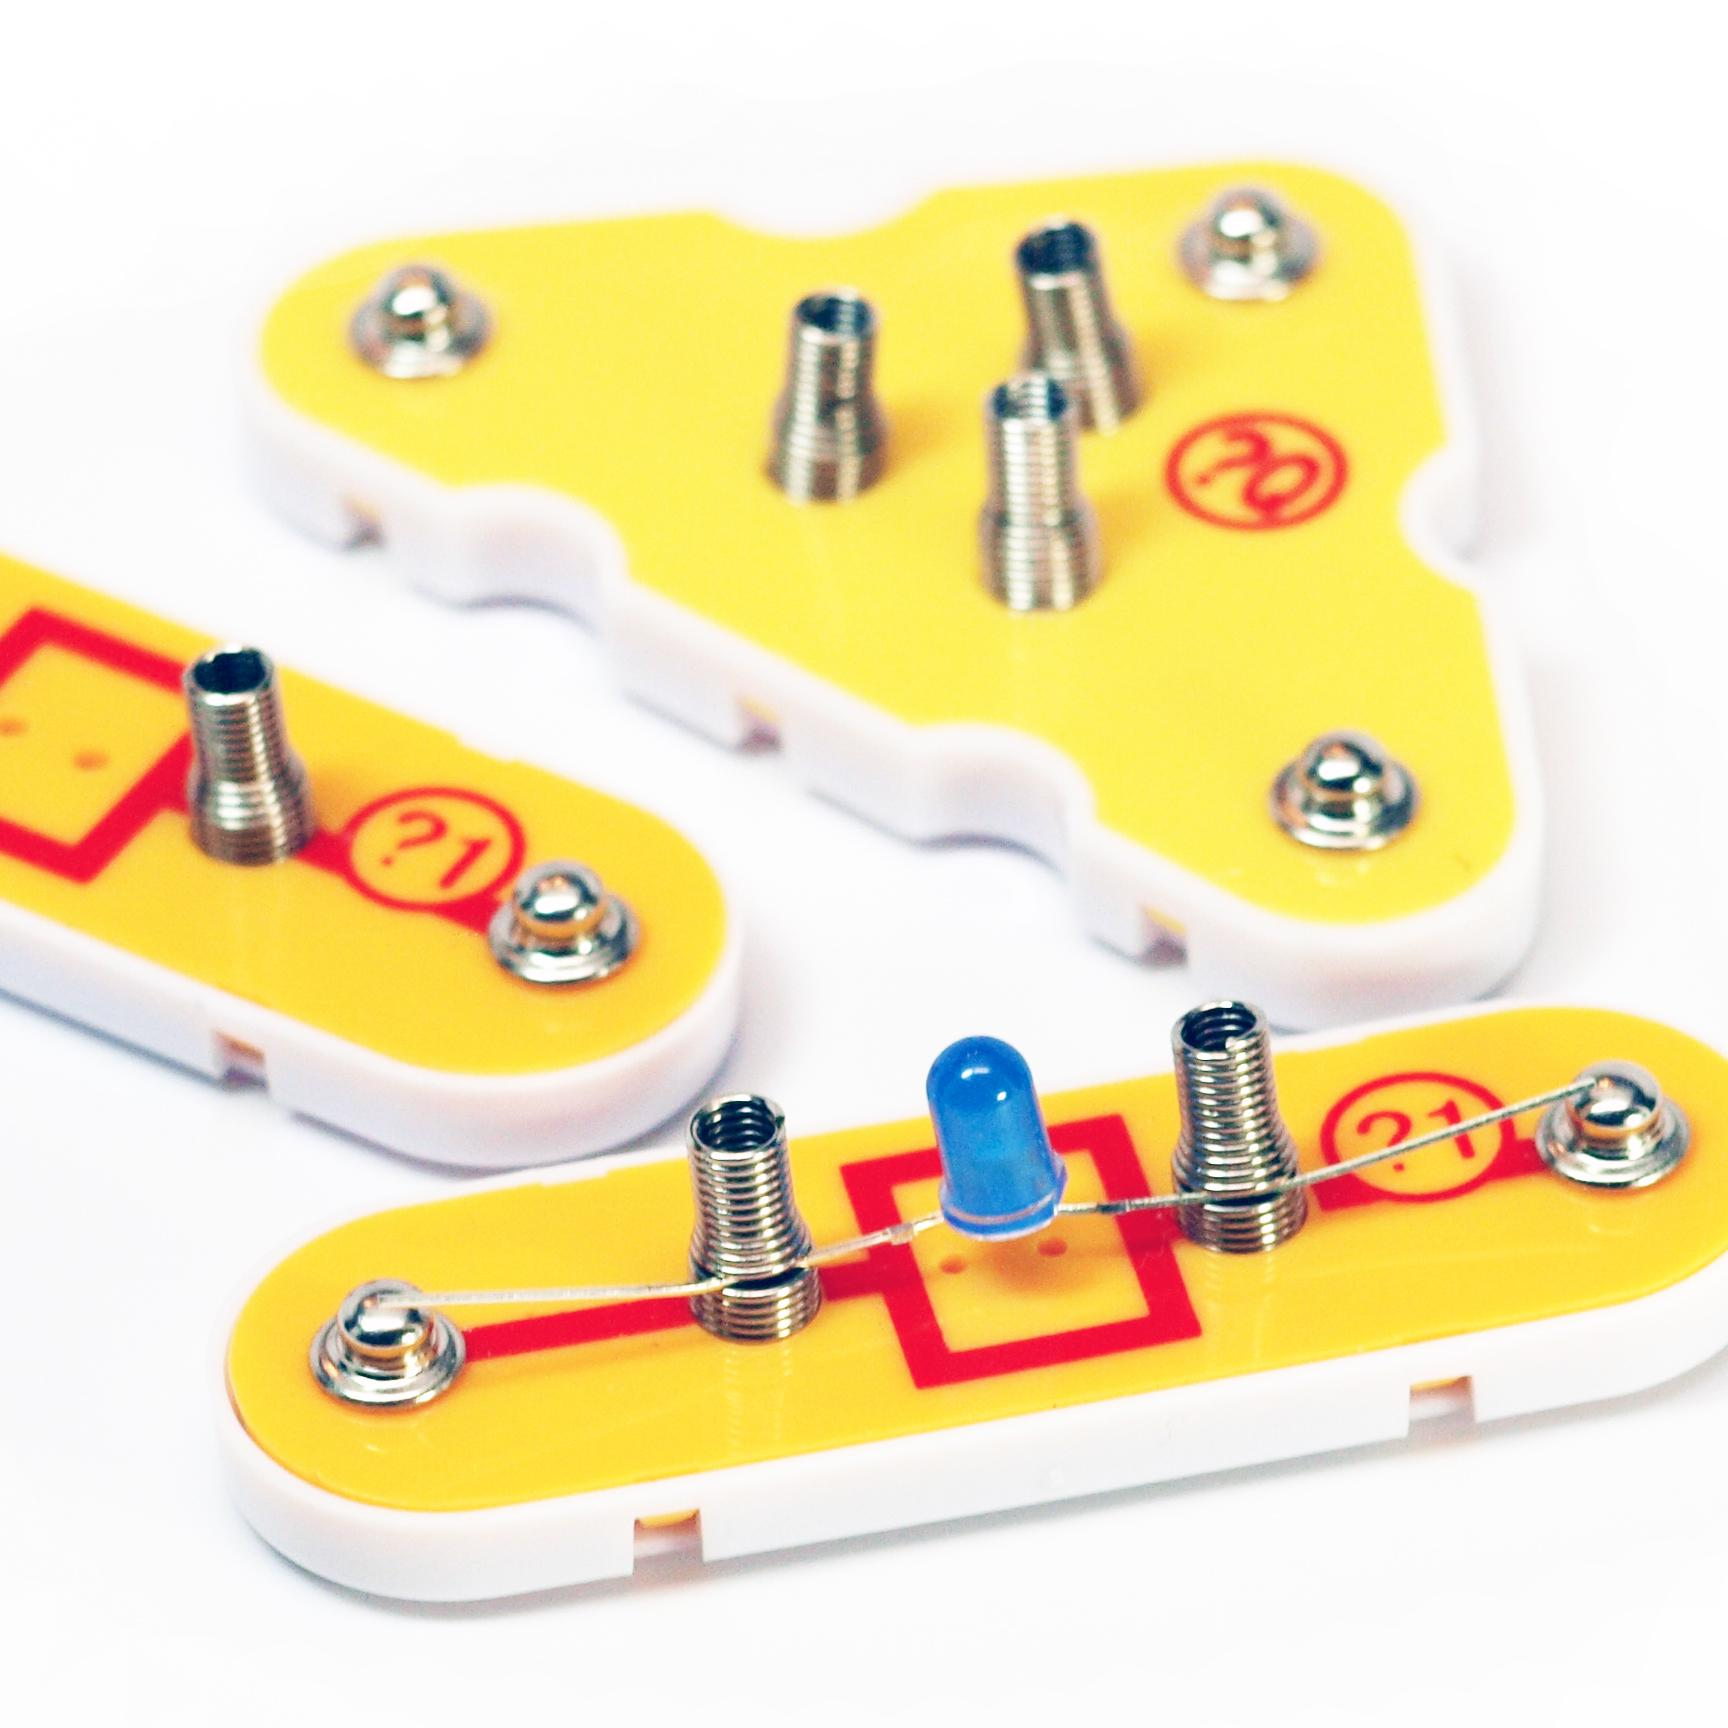 Amazon Snap Circuits Extreme Sc 750 Electronics Discovery Kit